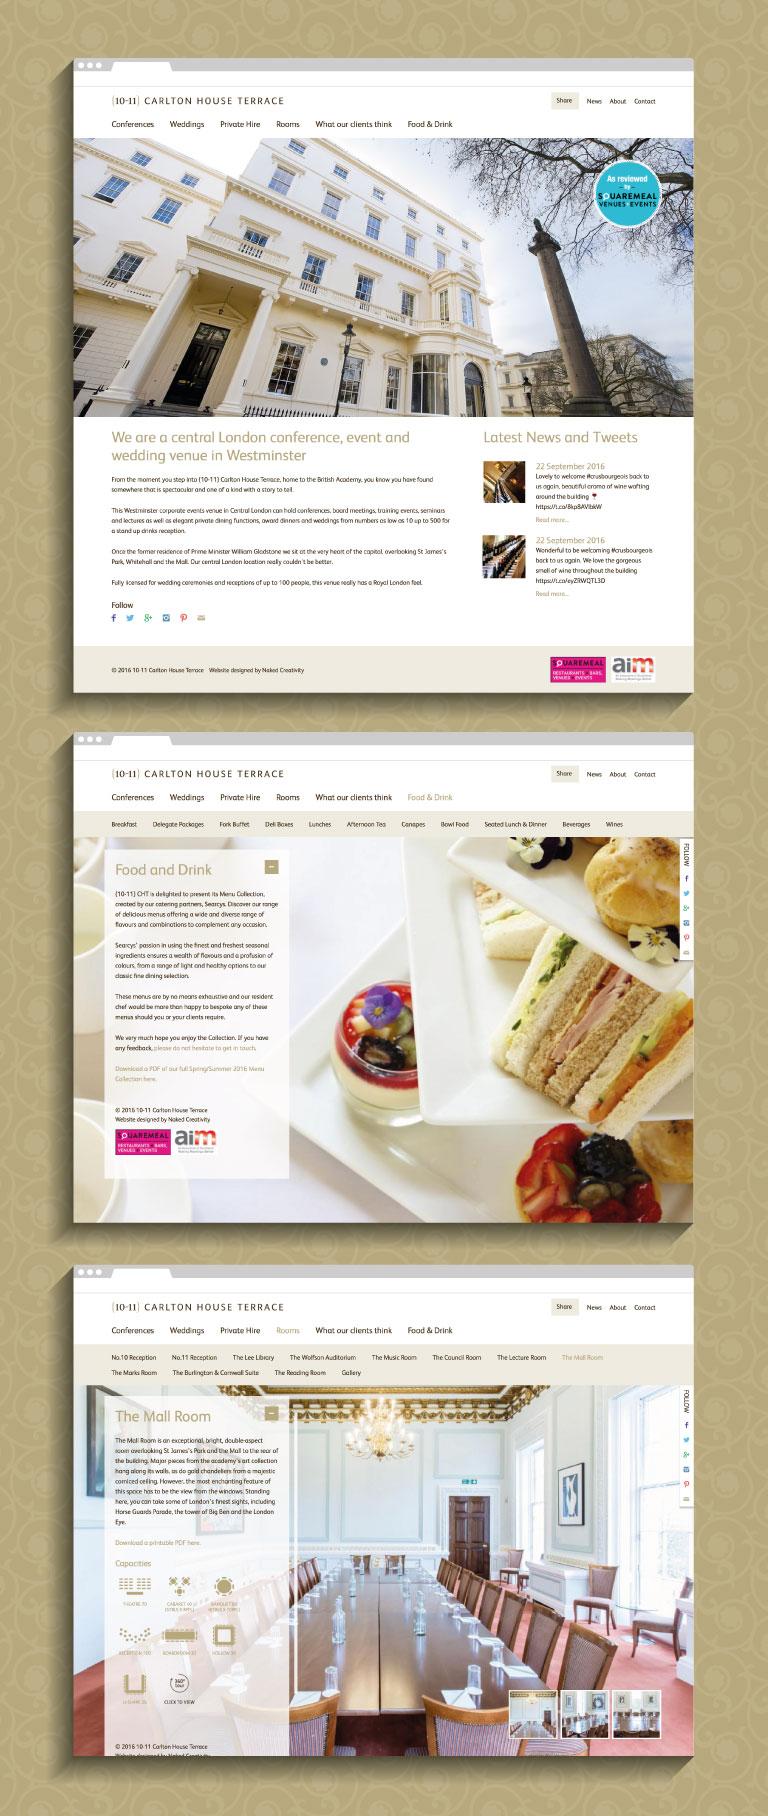 The 10-11 Carlton House Terrace website - mobile